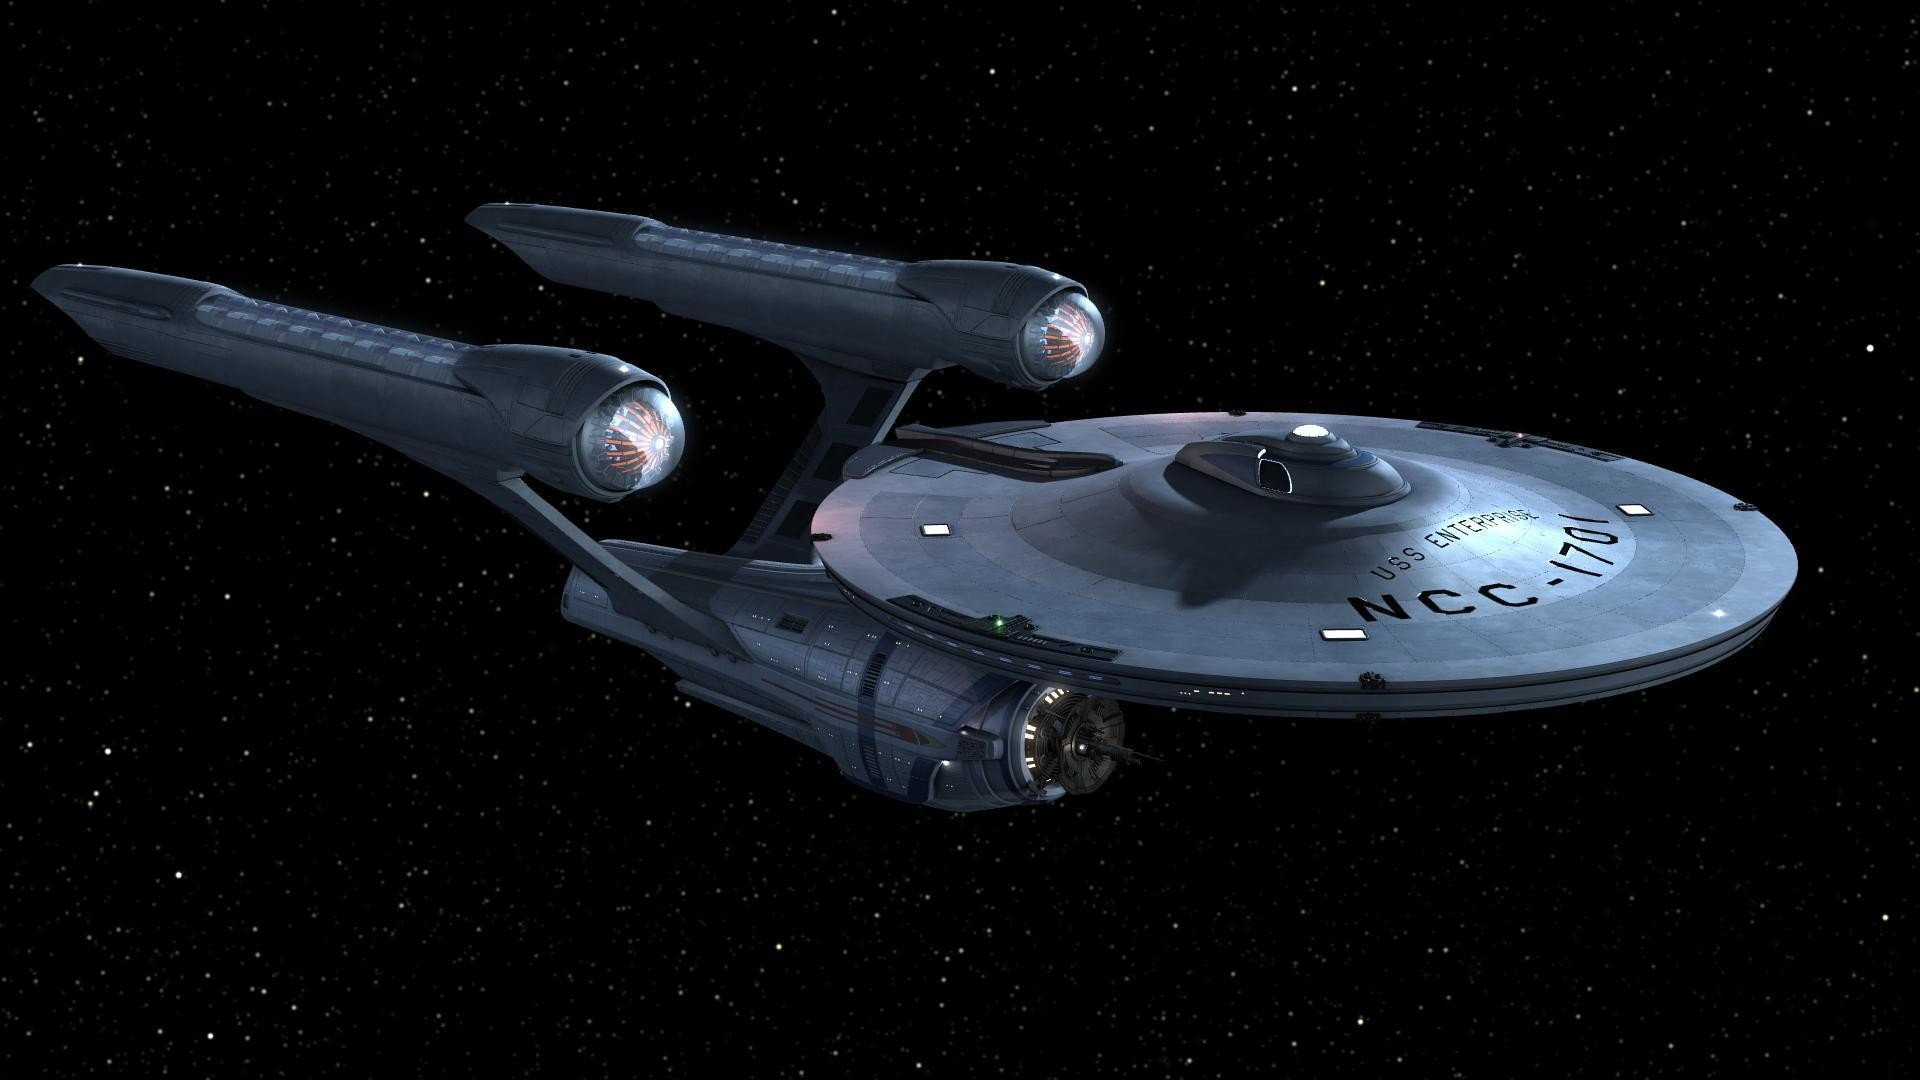 Star Trek Hd Wallpaper Picture Image Photo Dekstop 67665 Label .